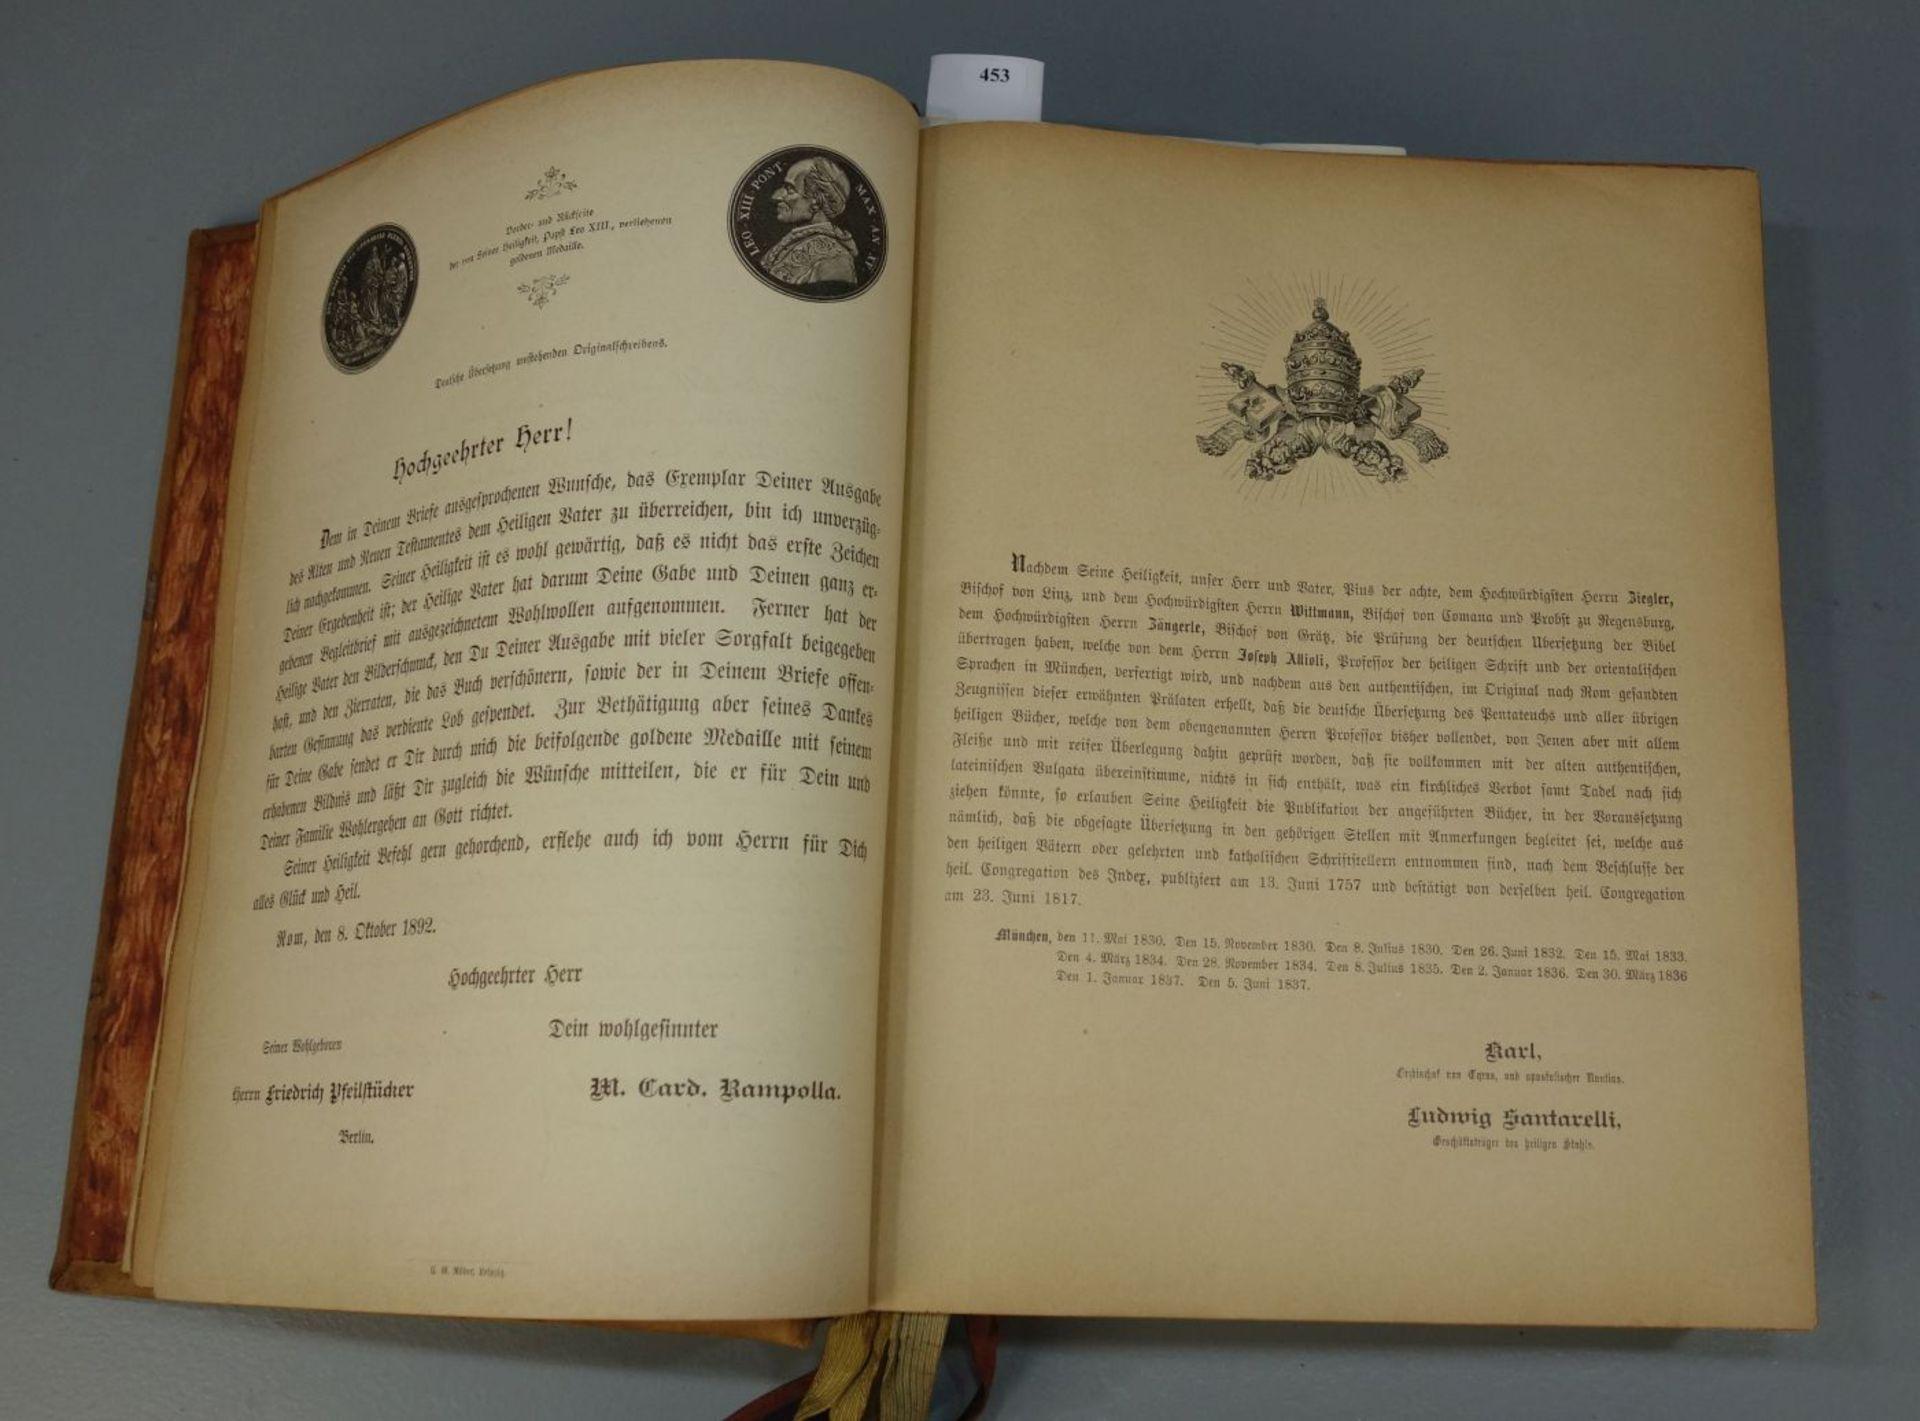 BIBEL IM LEDEREINBAND - Image 8 of 8